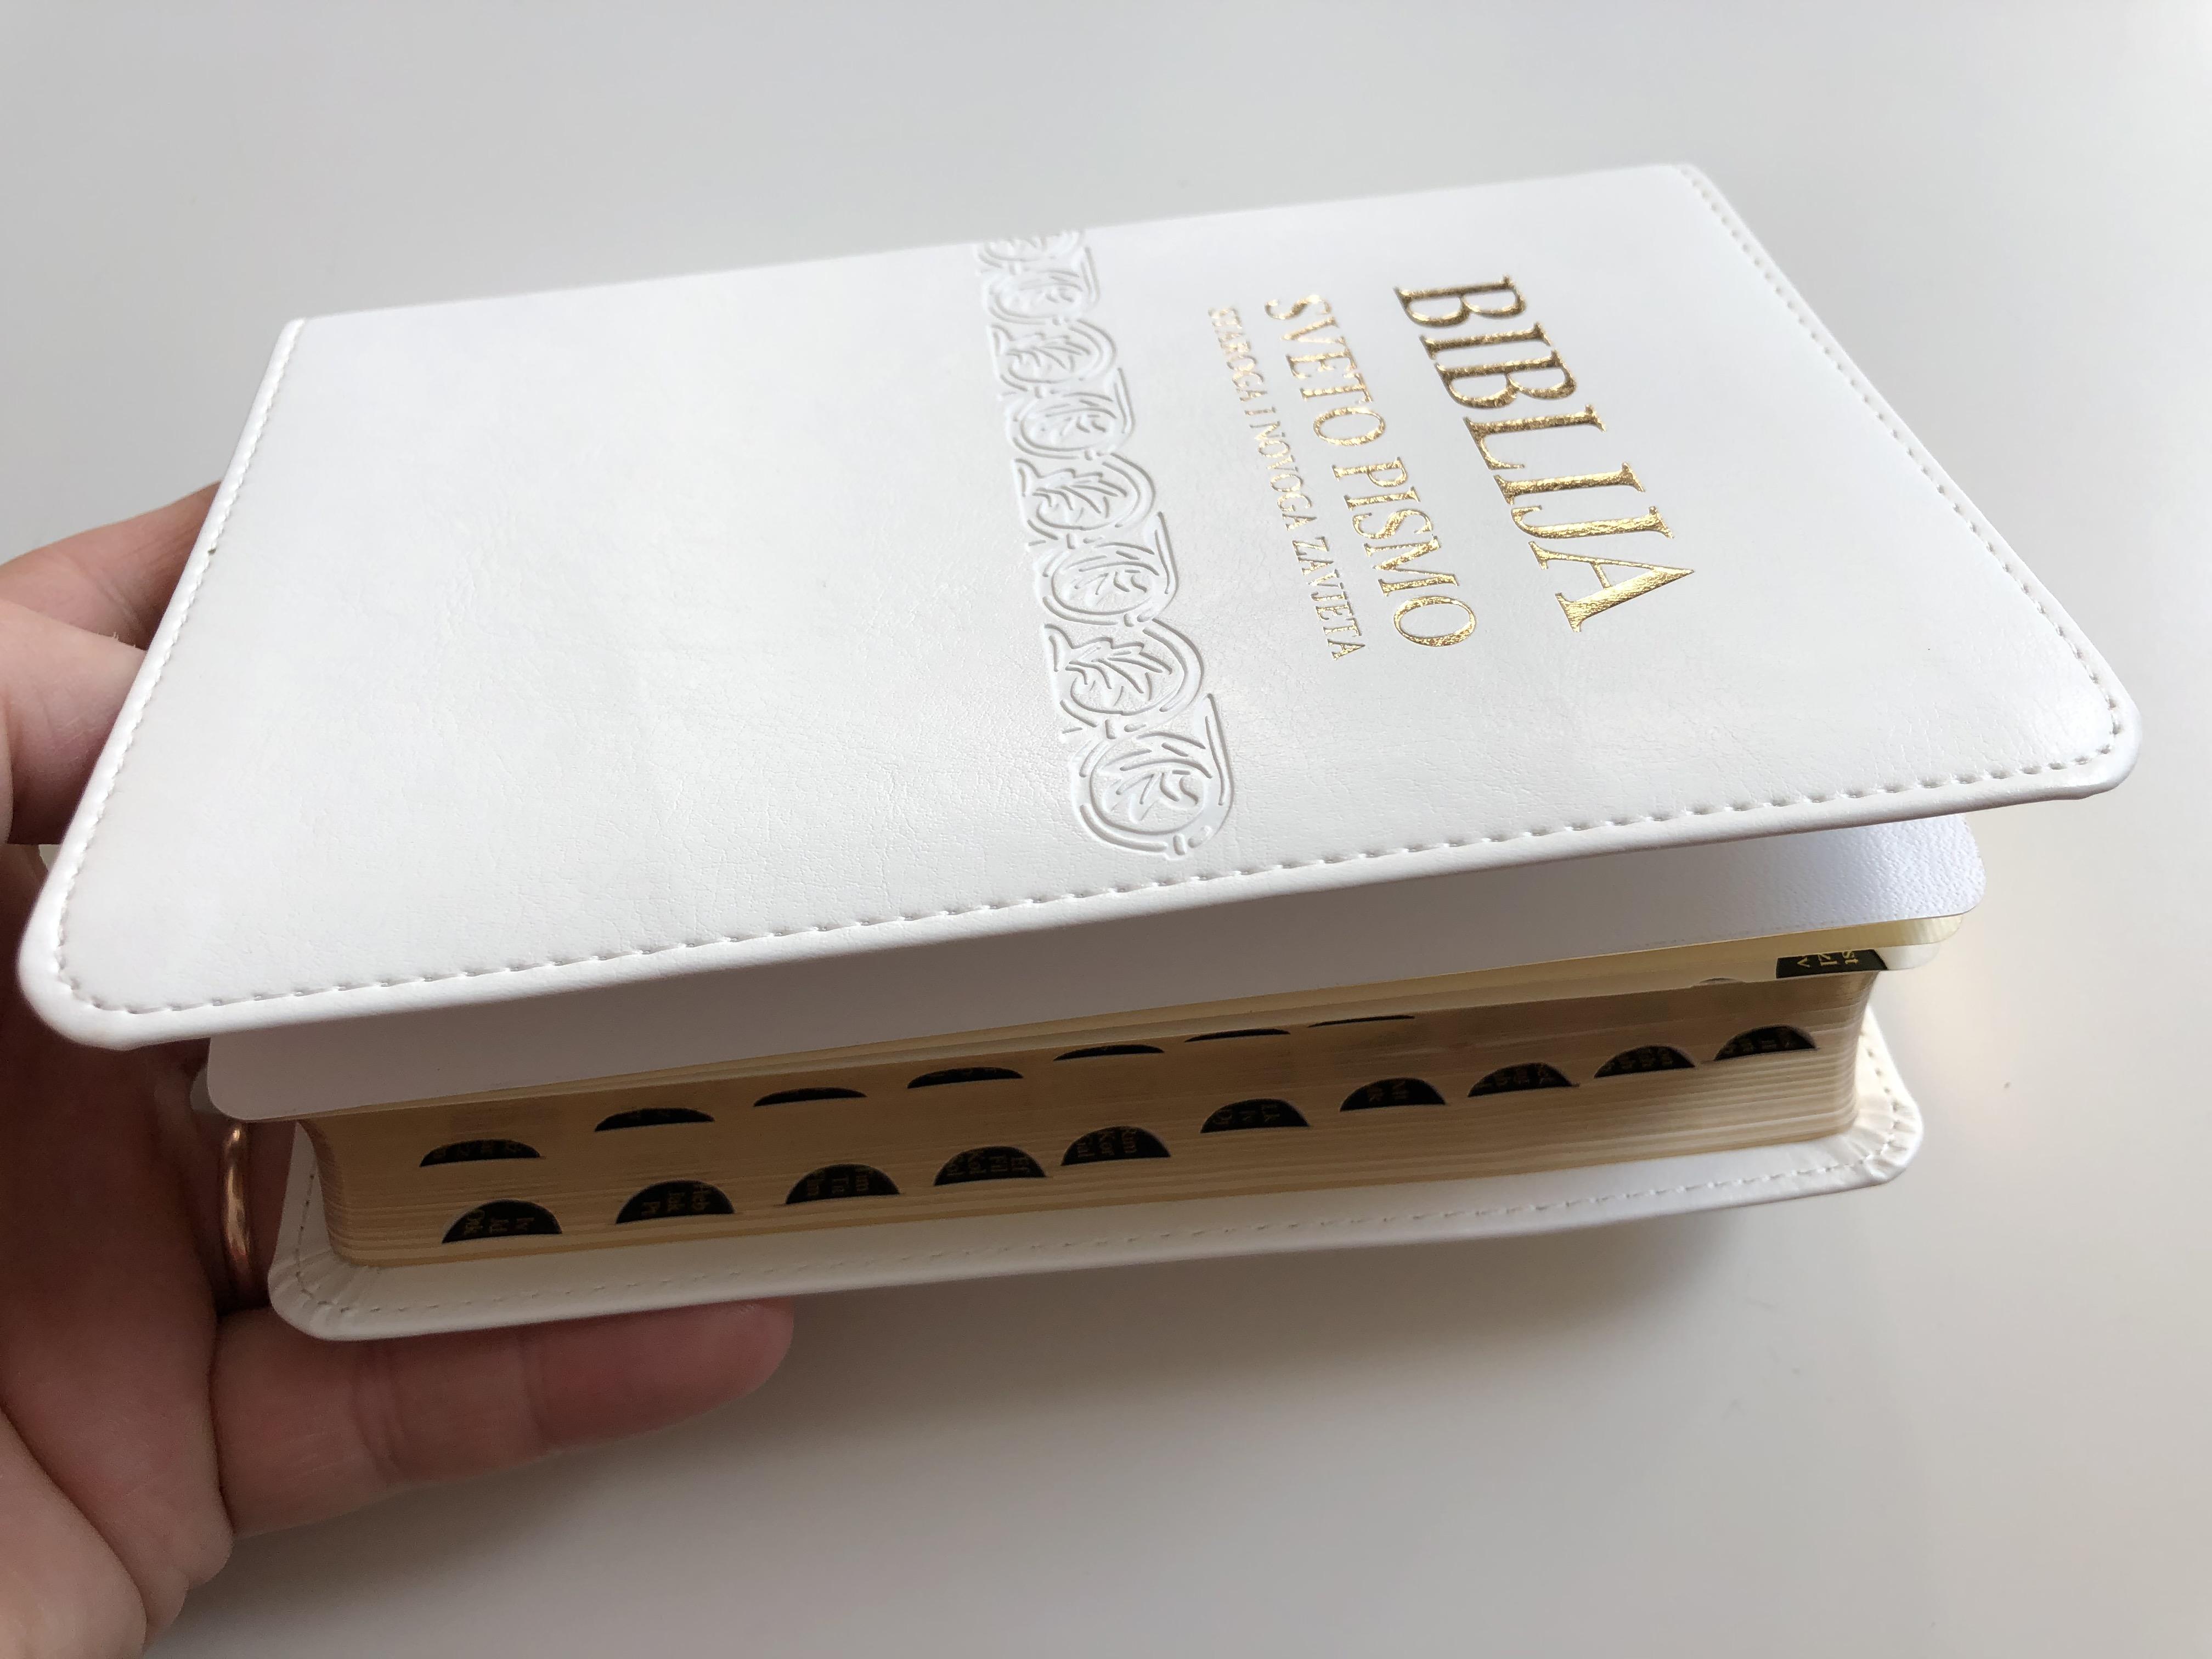 biblija-sveto-pismo-staroga-i-novoga-zavjeta-croatian-language-holy-bible-3.jpg